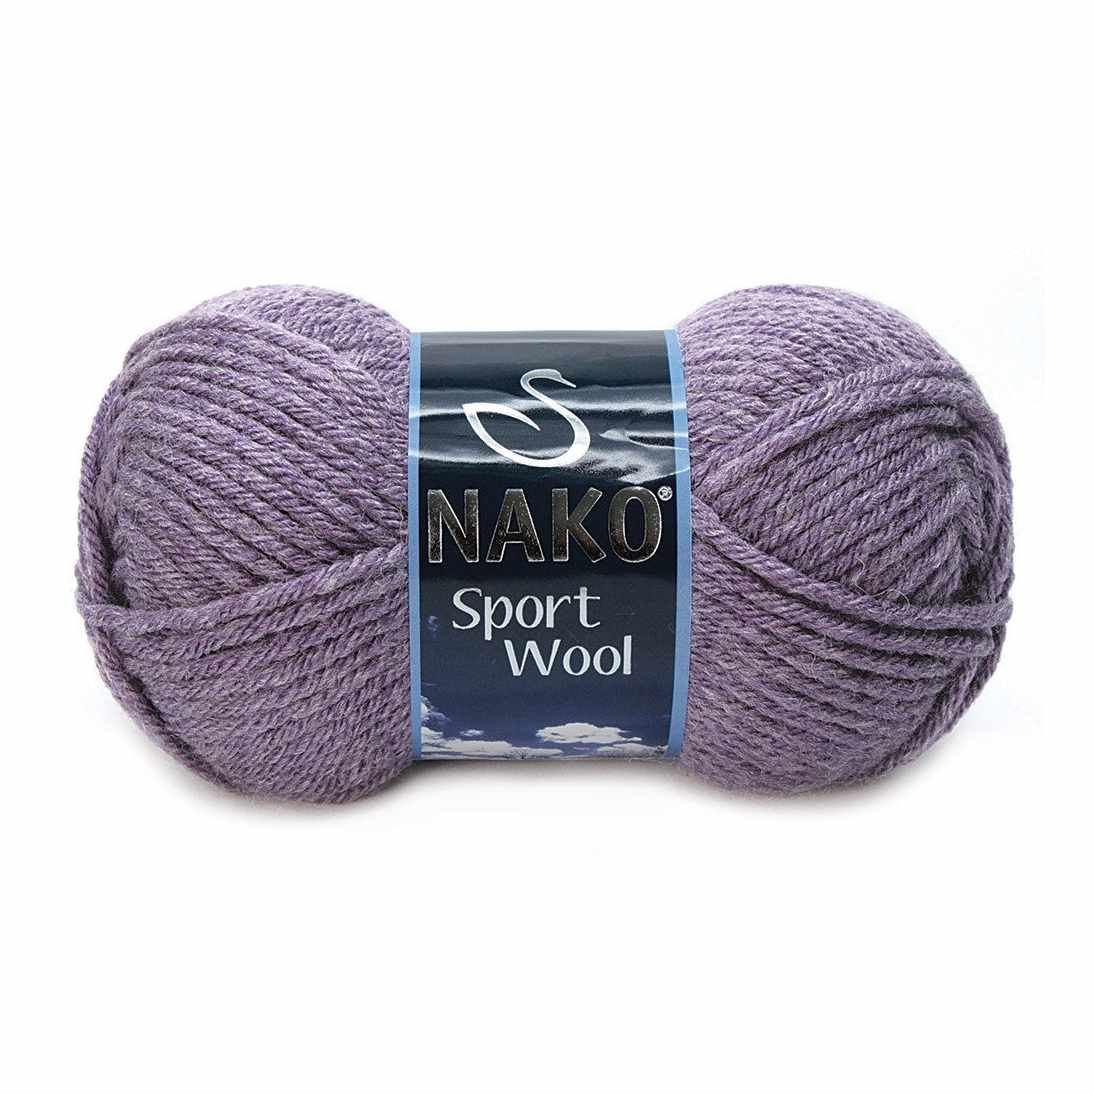 Пряжа Nako Sport Wool Цвет.23331 Т.Сирень